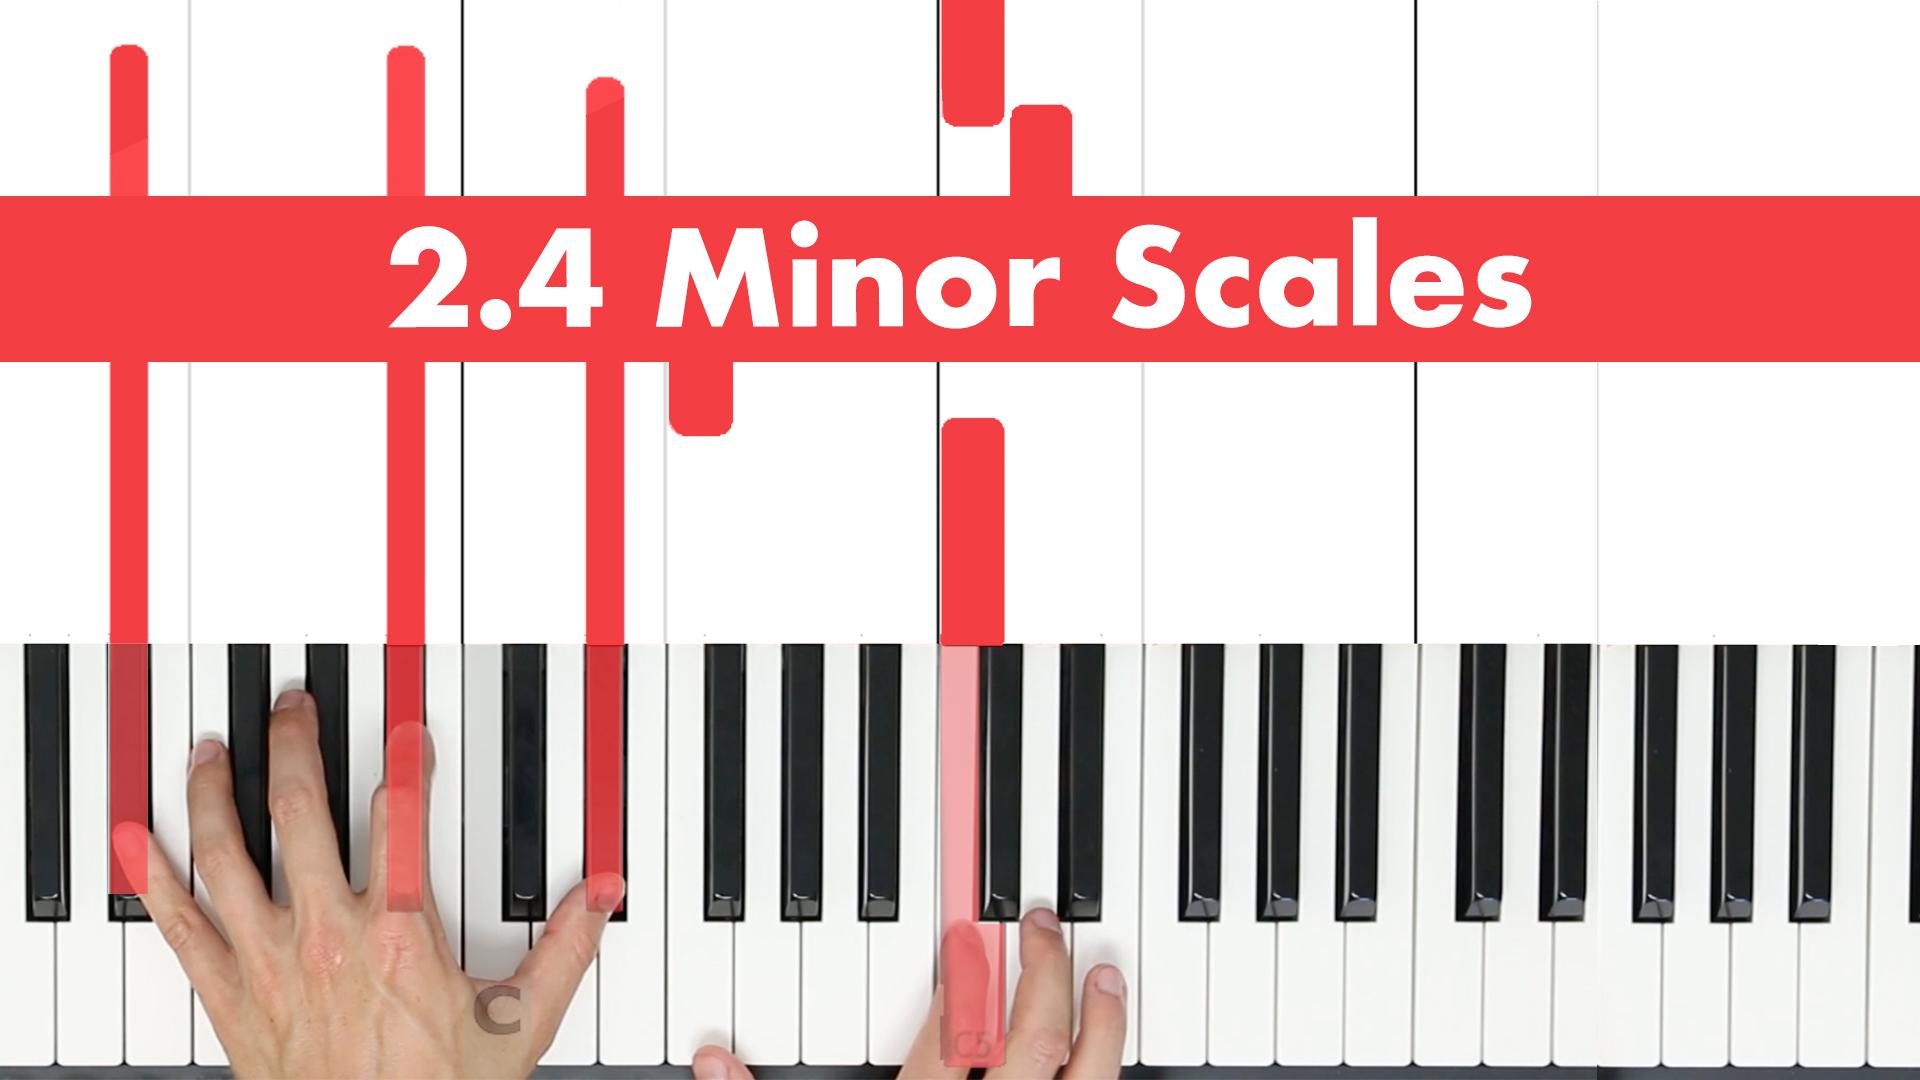 2.4 Minor Scales